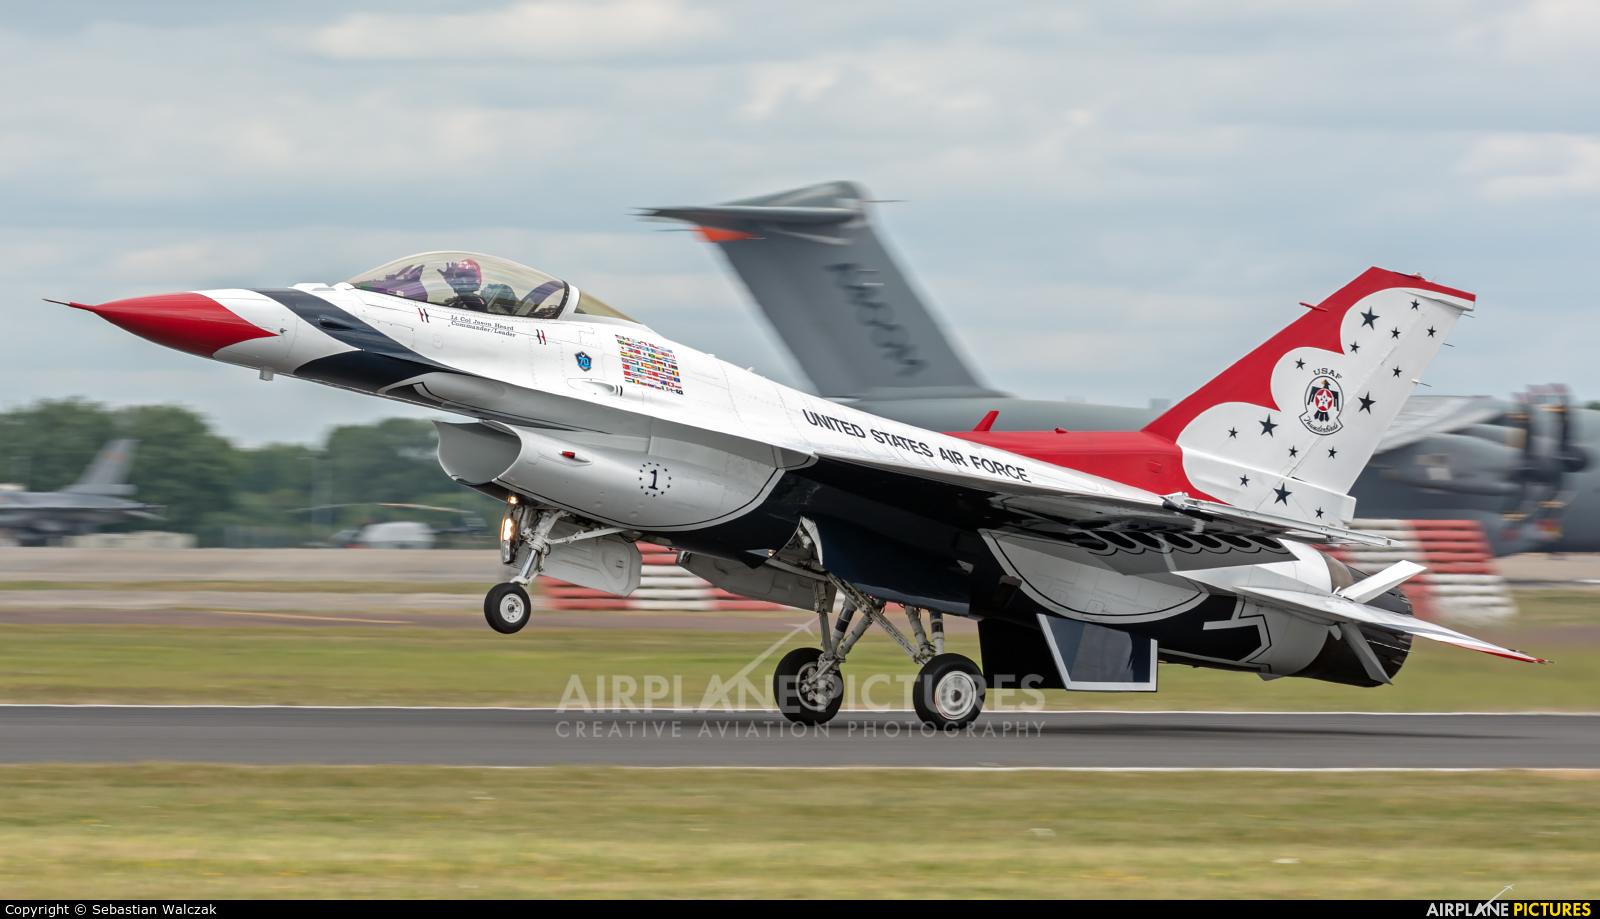 USA - Air Force : Thunderbirds 92-3880 aircraft at Fairford